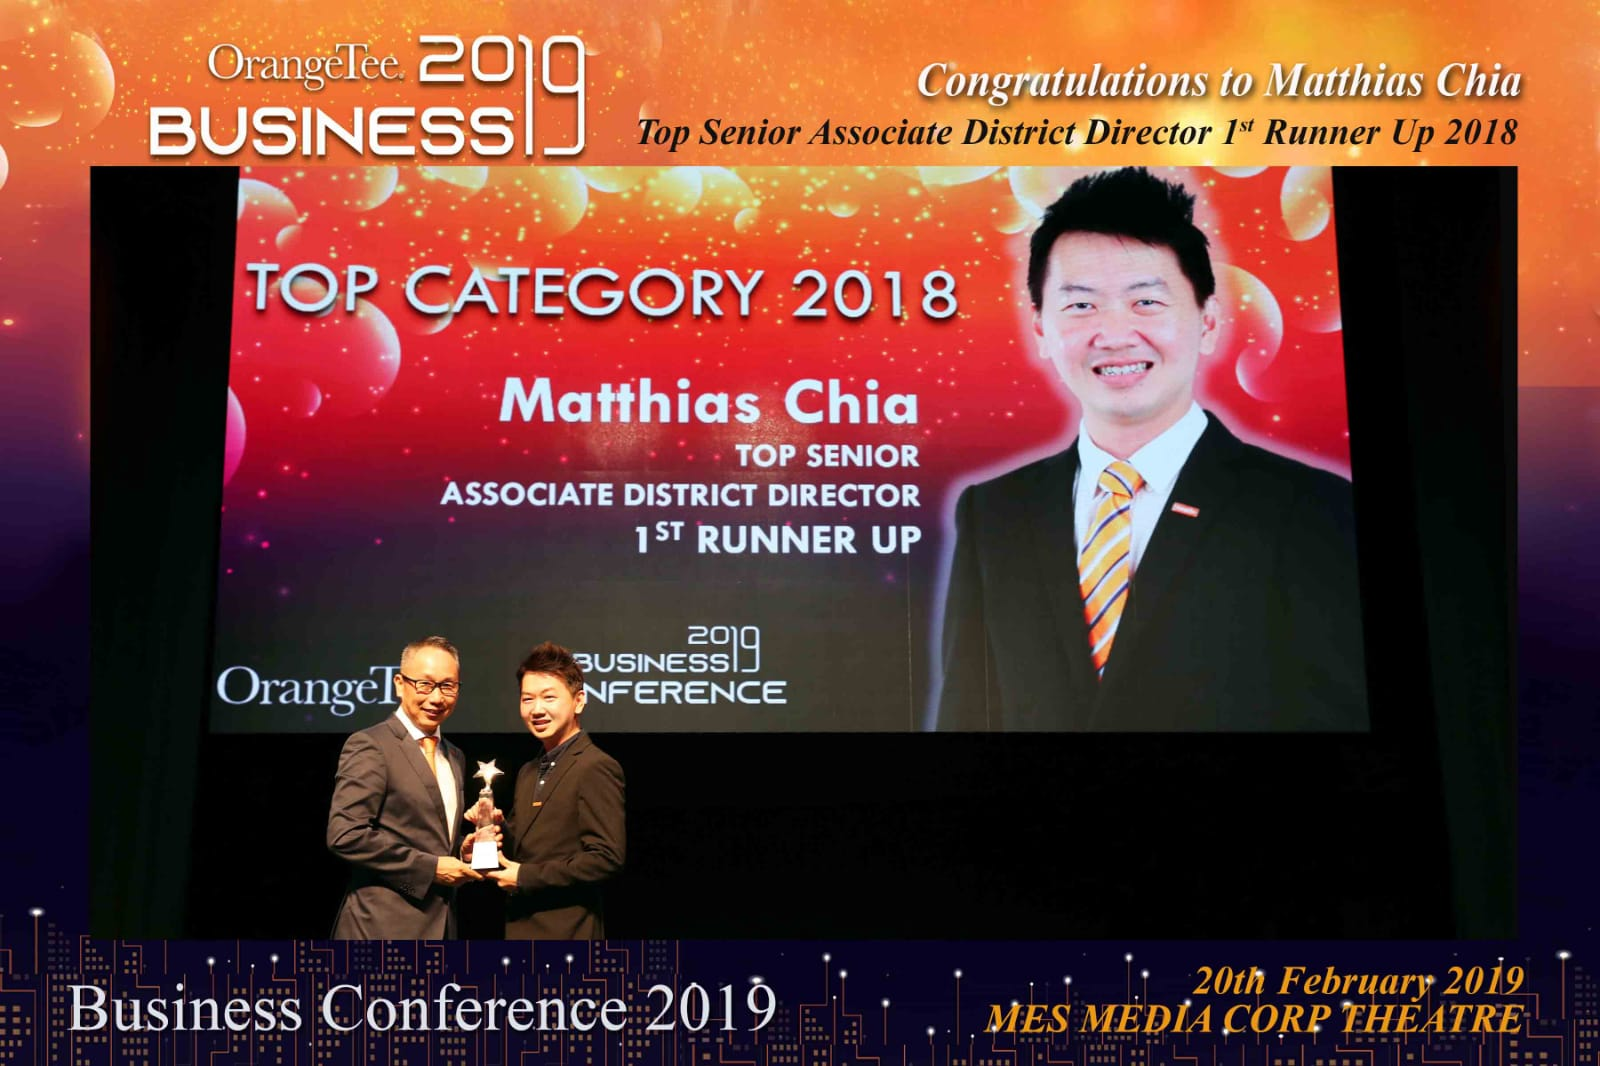 Matthias Chia receiving an award